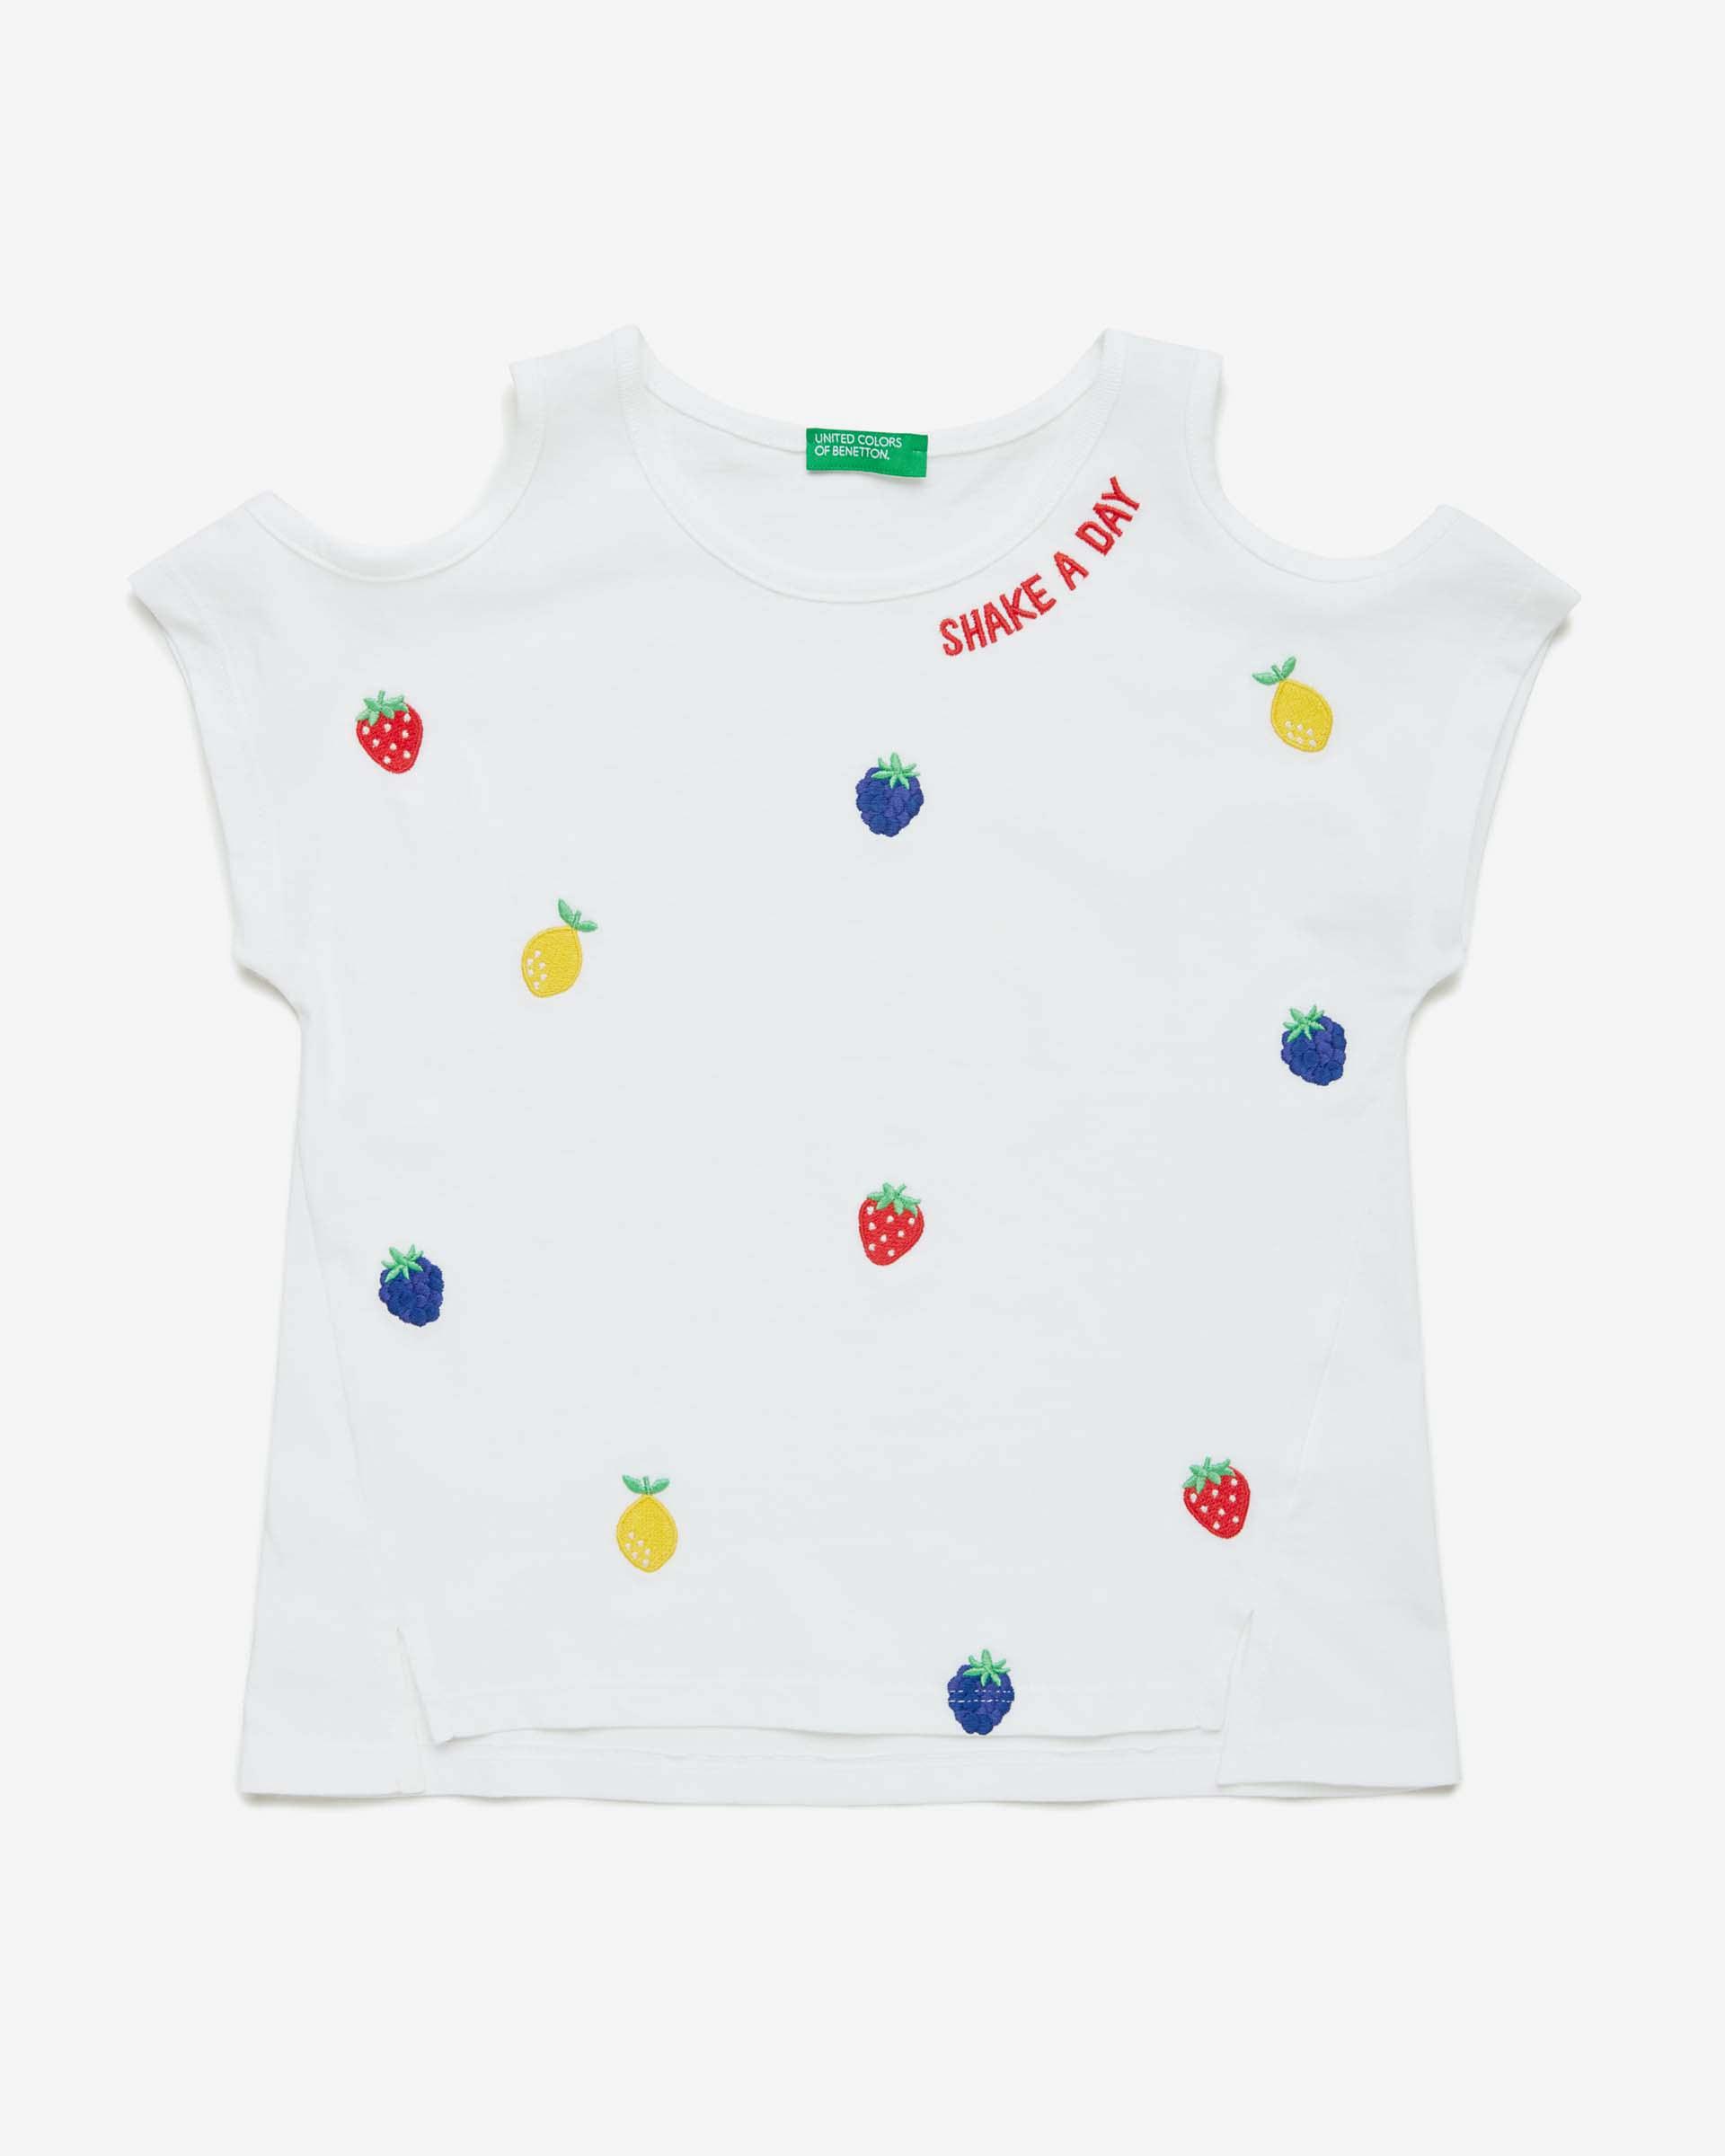 Купить 20P_3096C14LY_101, Футболка для девочек Benetton 3096C14LY_101 р-р 170, United Colors of Benetton, Футболки для девочек